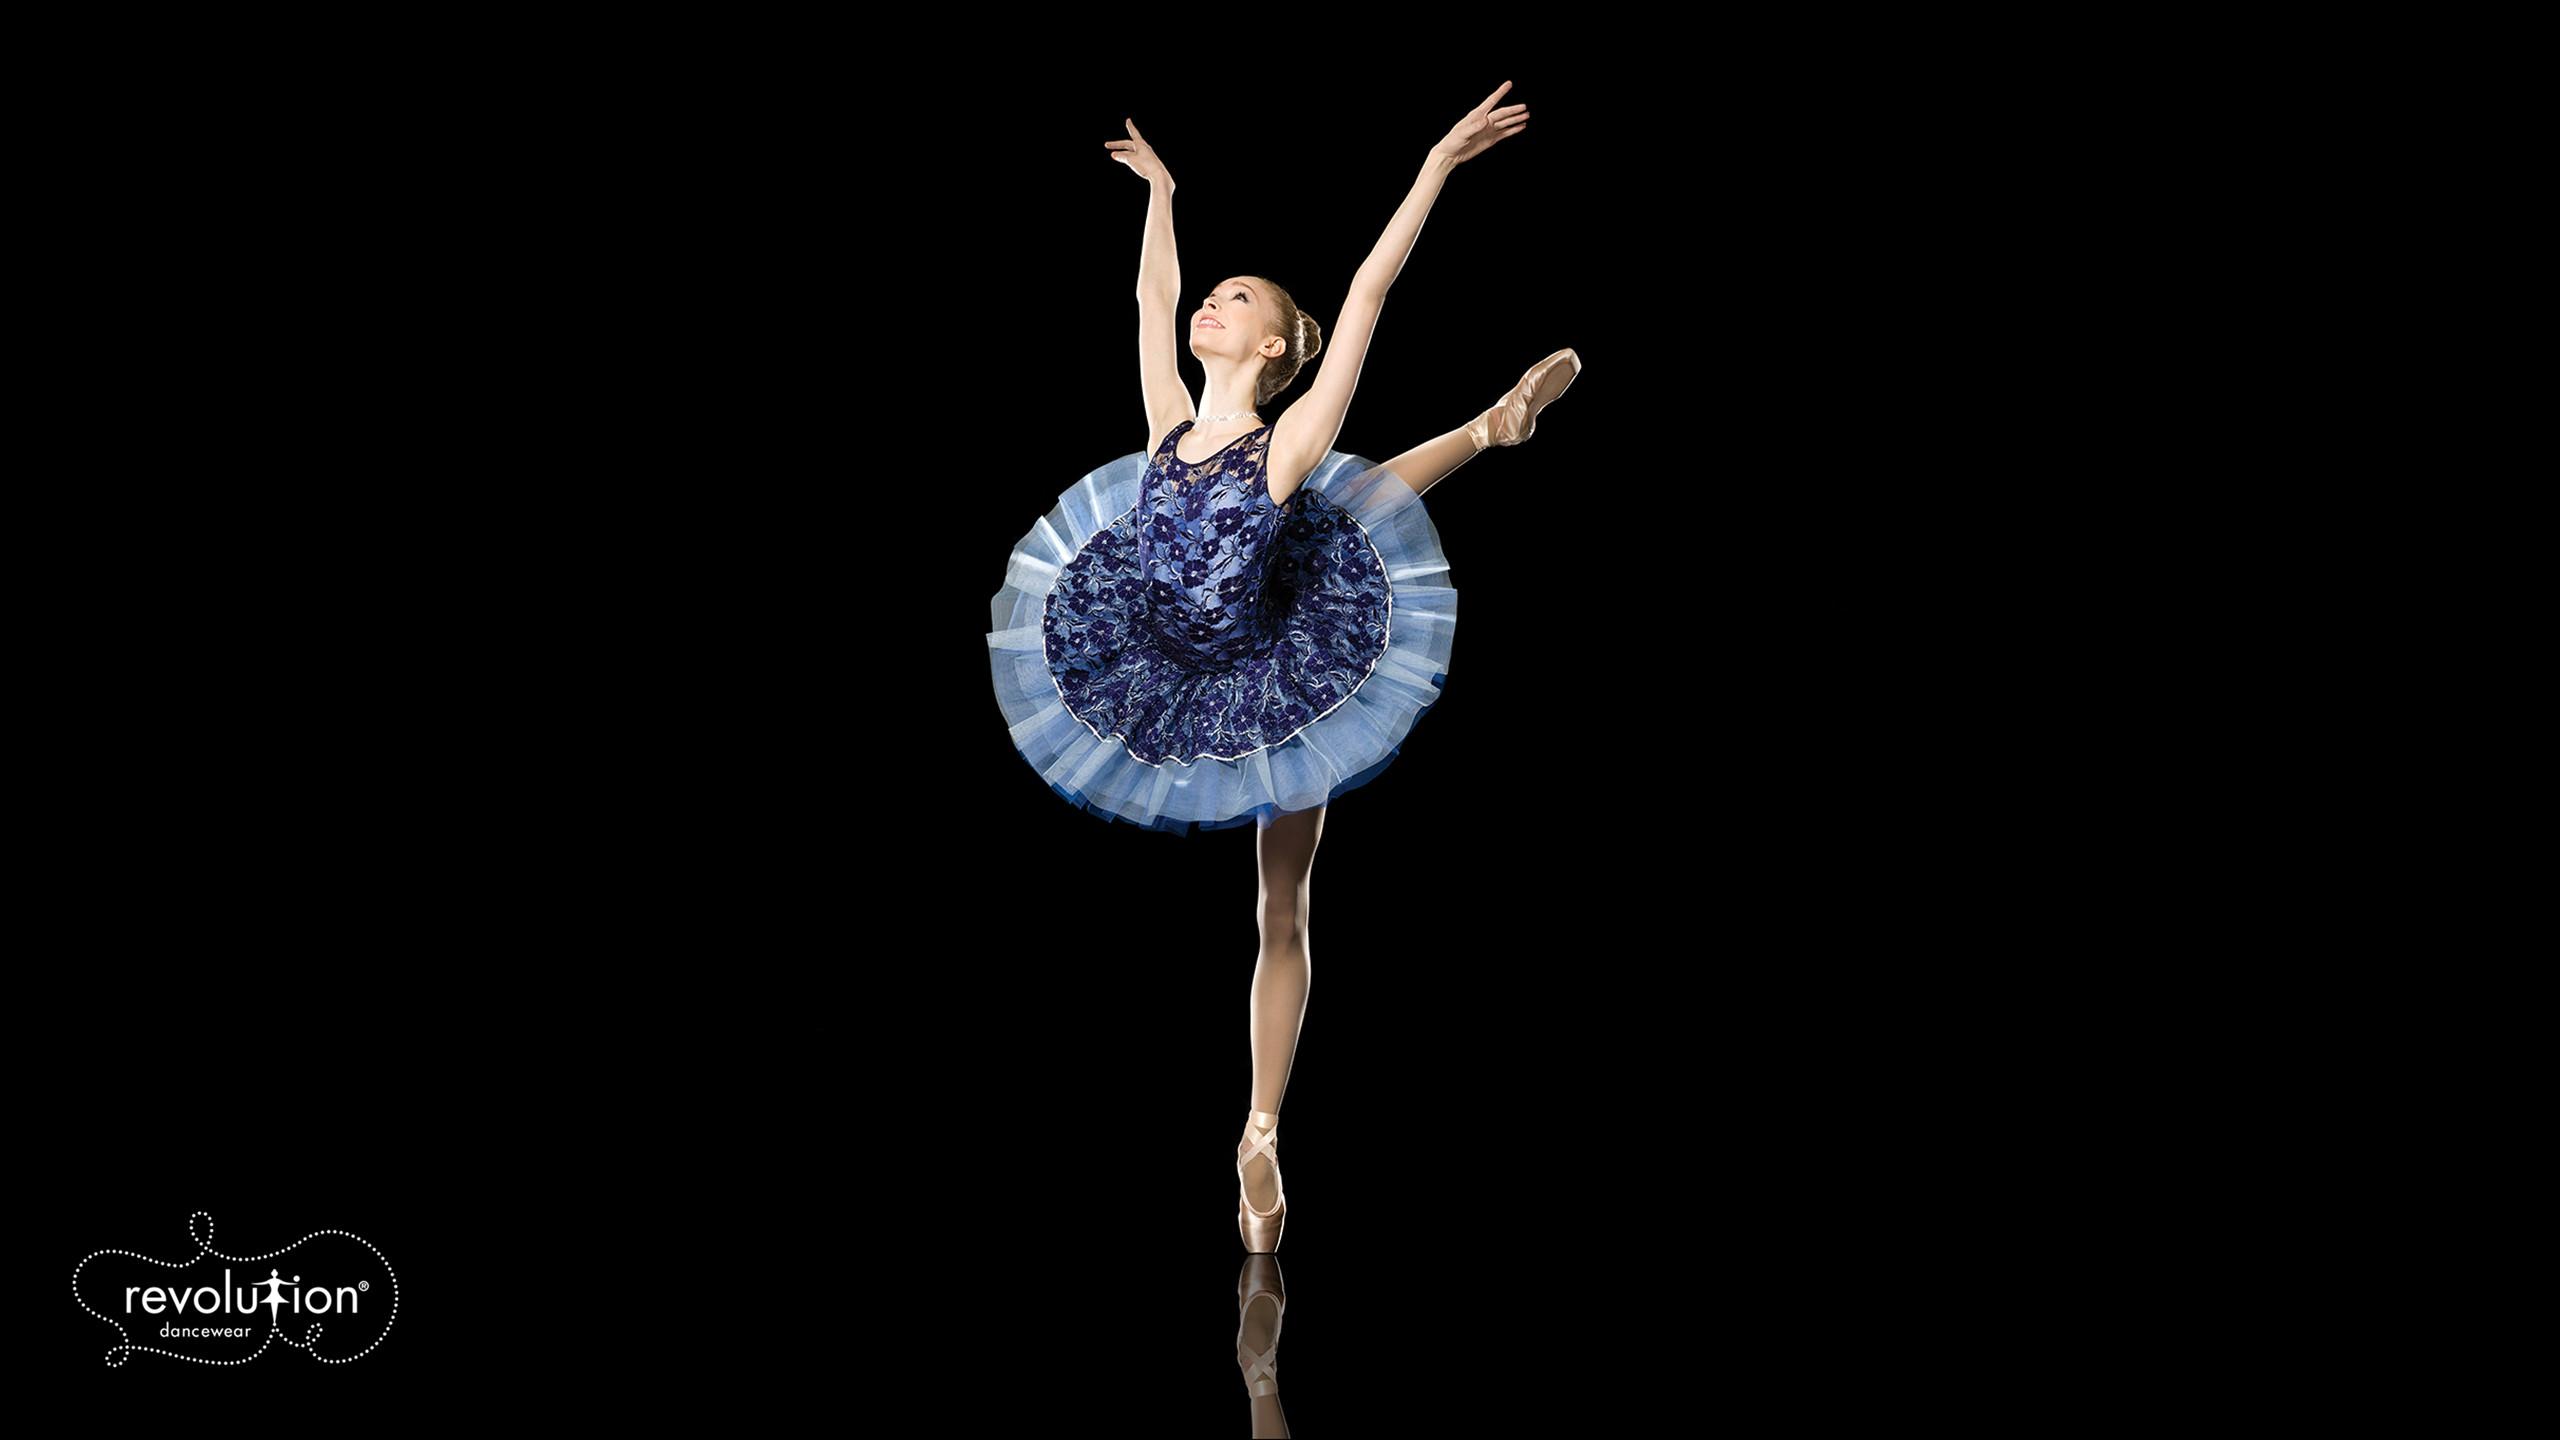 Балерина  № 1822277 загрузить